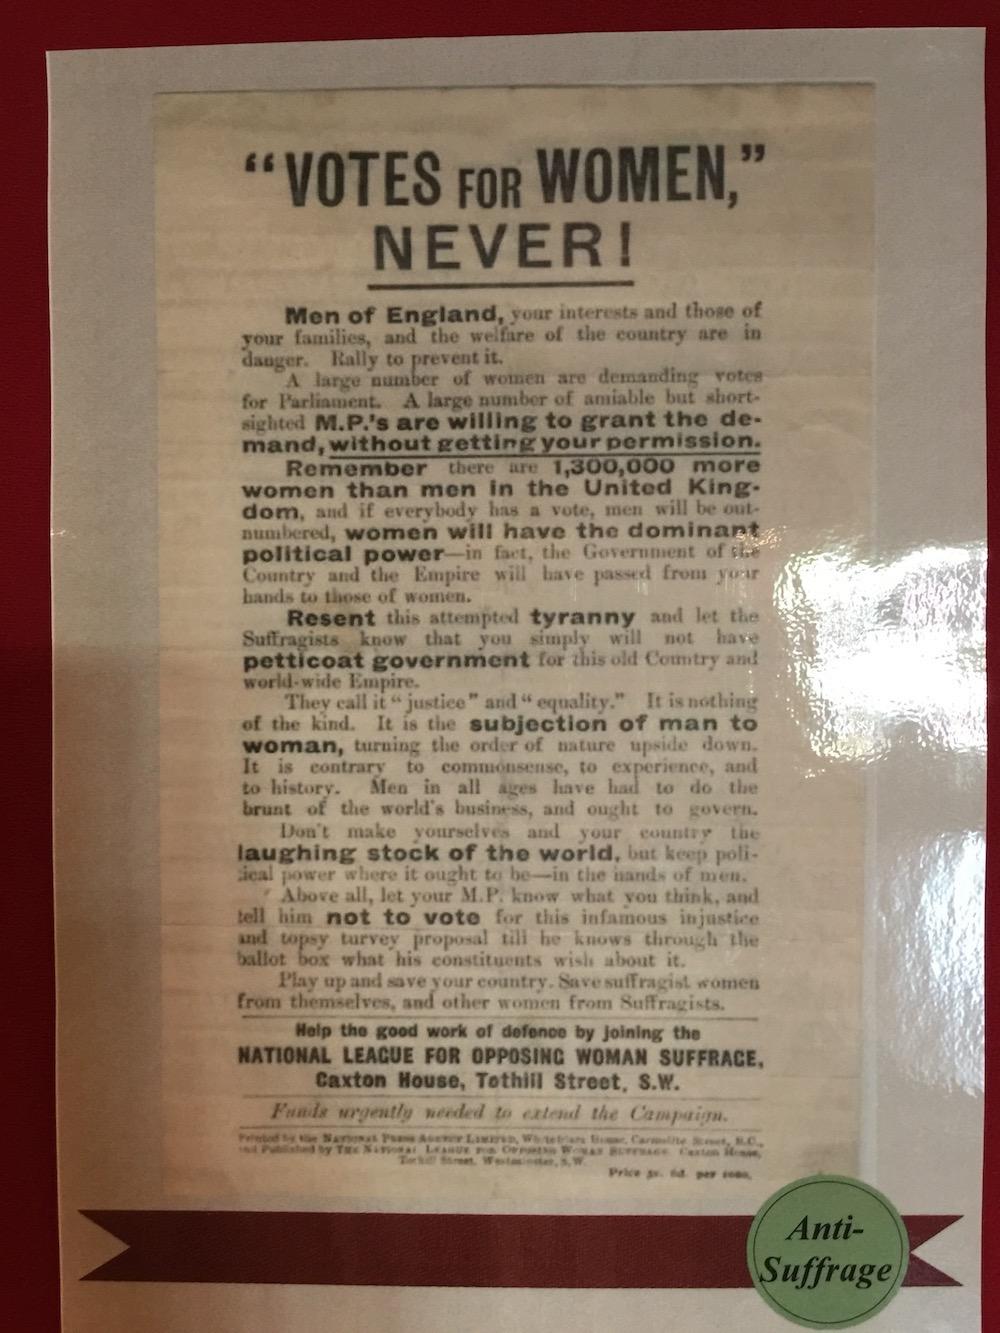 votes-for-women-never